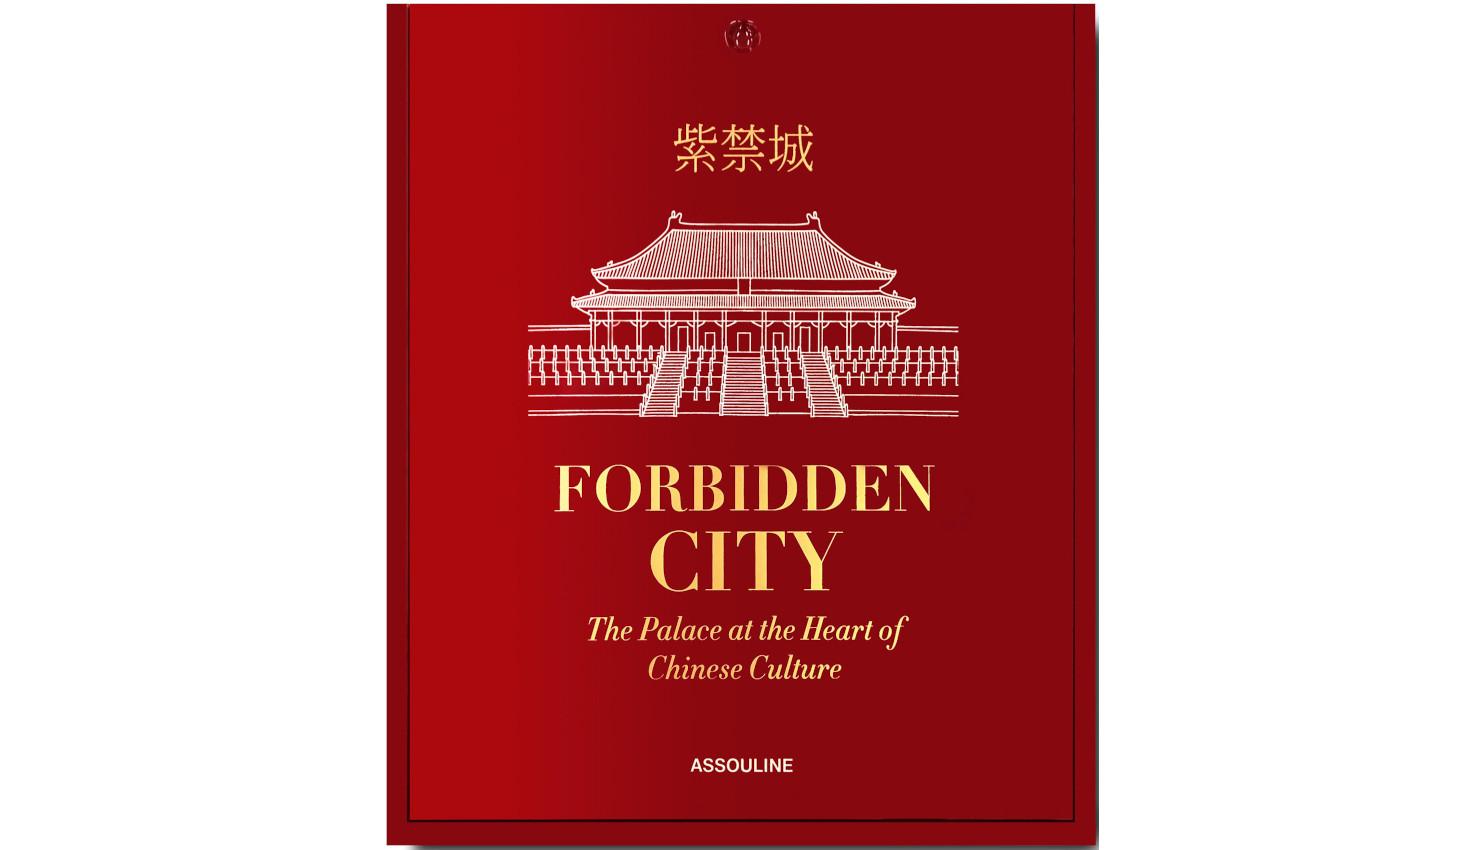 forbiddencity-assouline-magazinehorse.jpg